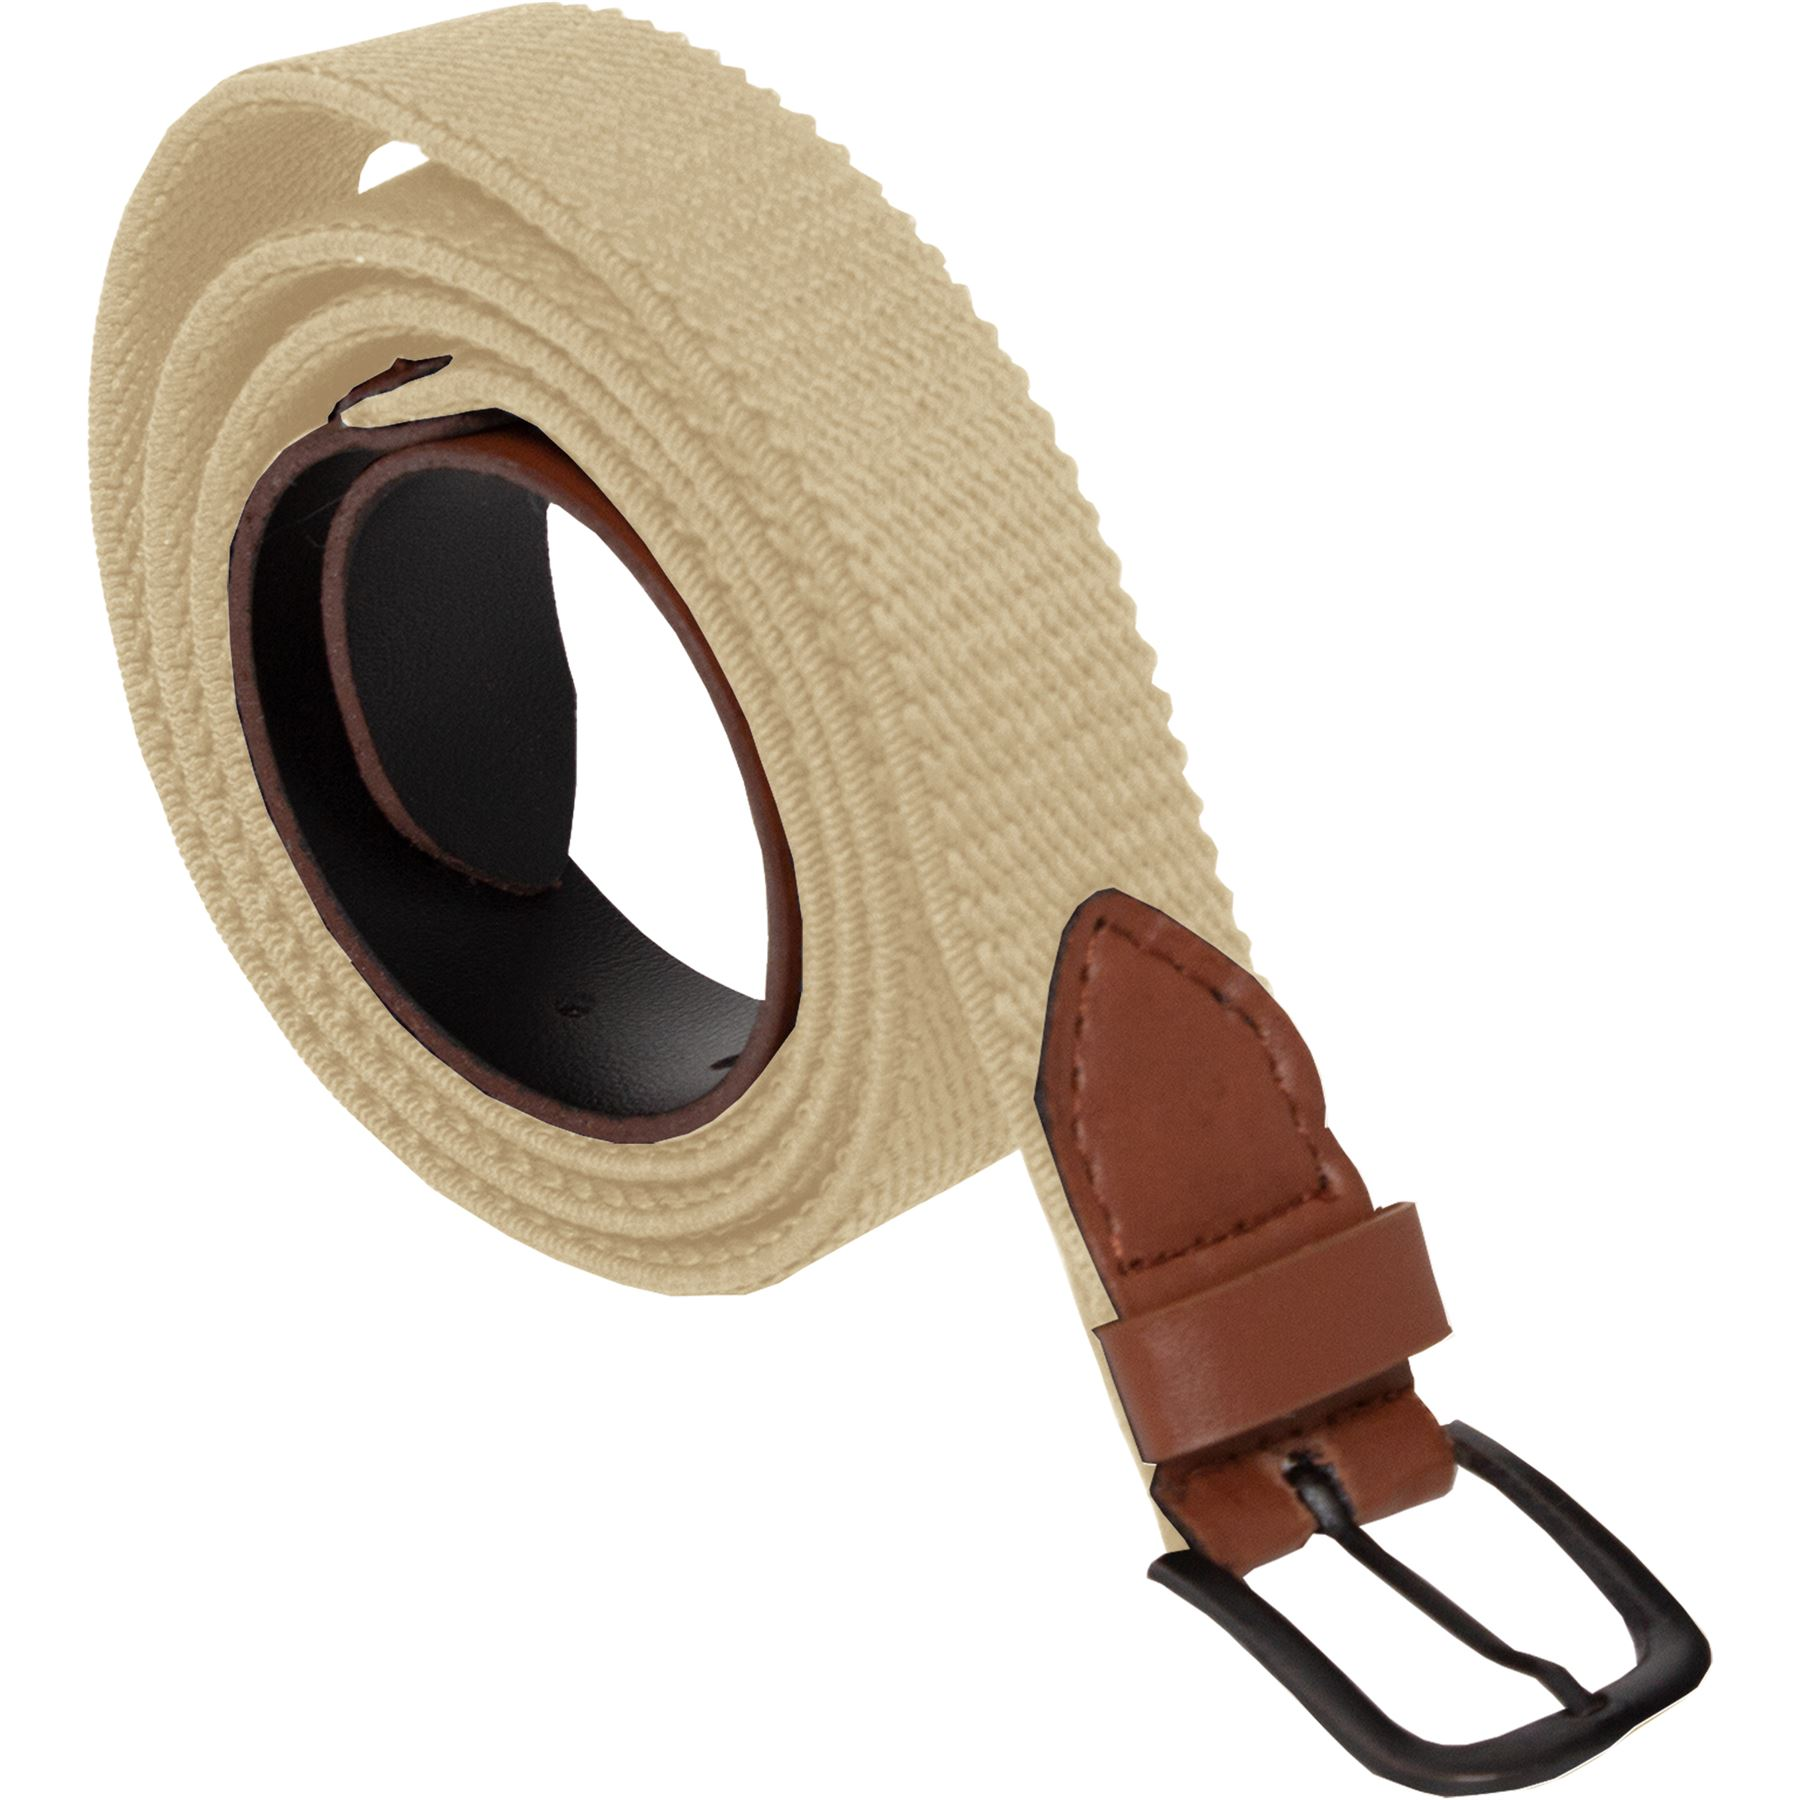 ENZO-Mens-Womens-Elasticated-Belts-Canvas-Stretch-PU-Leather-Trim-Braided-Belt Indexbild 7